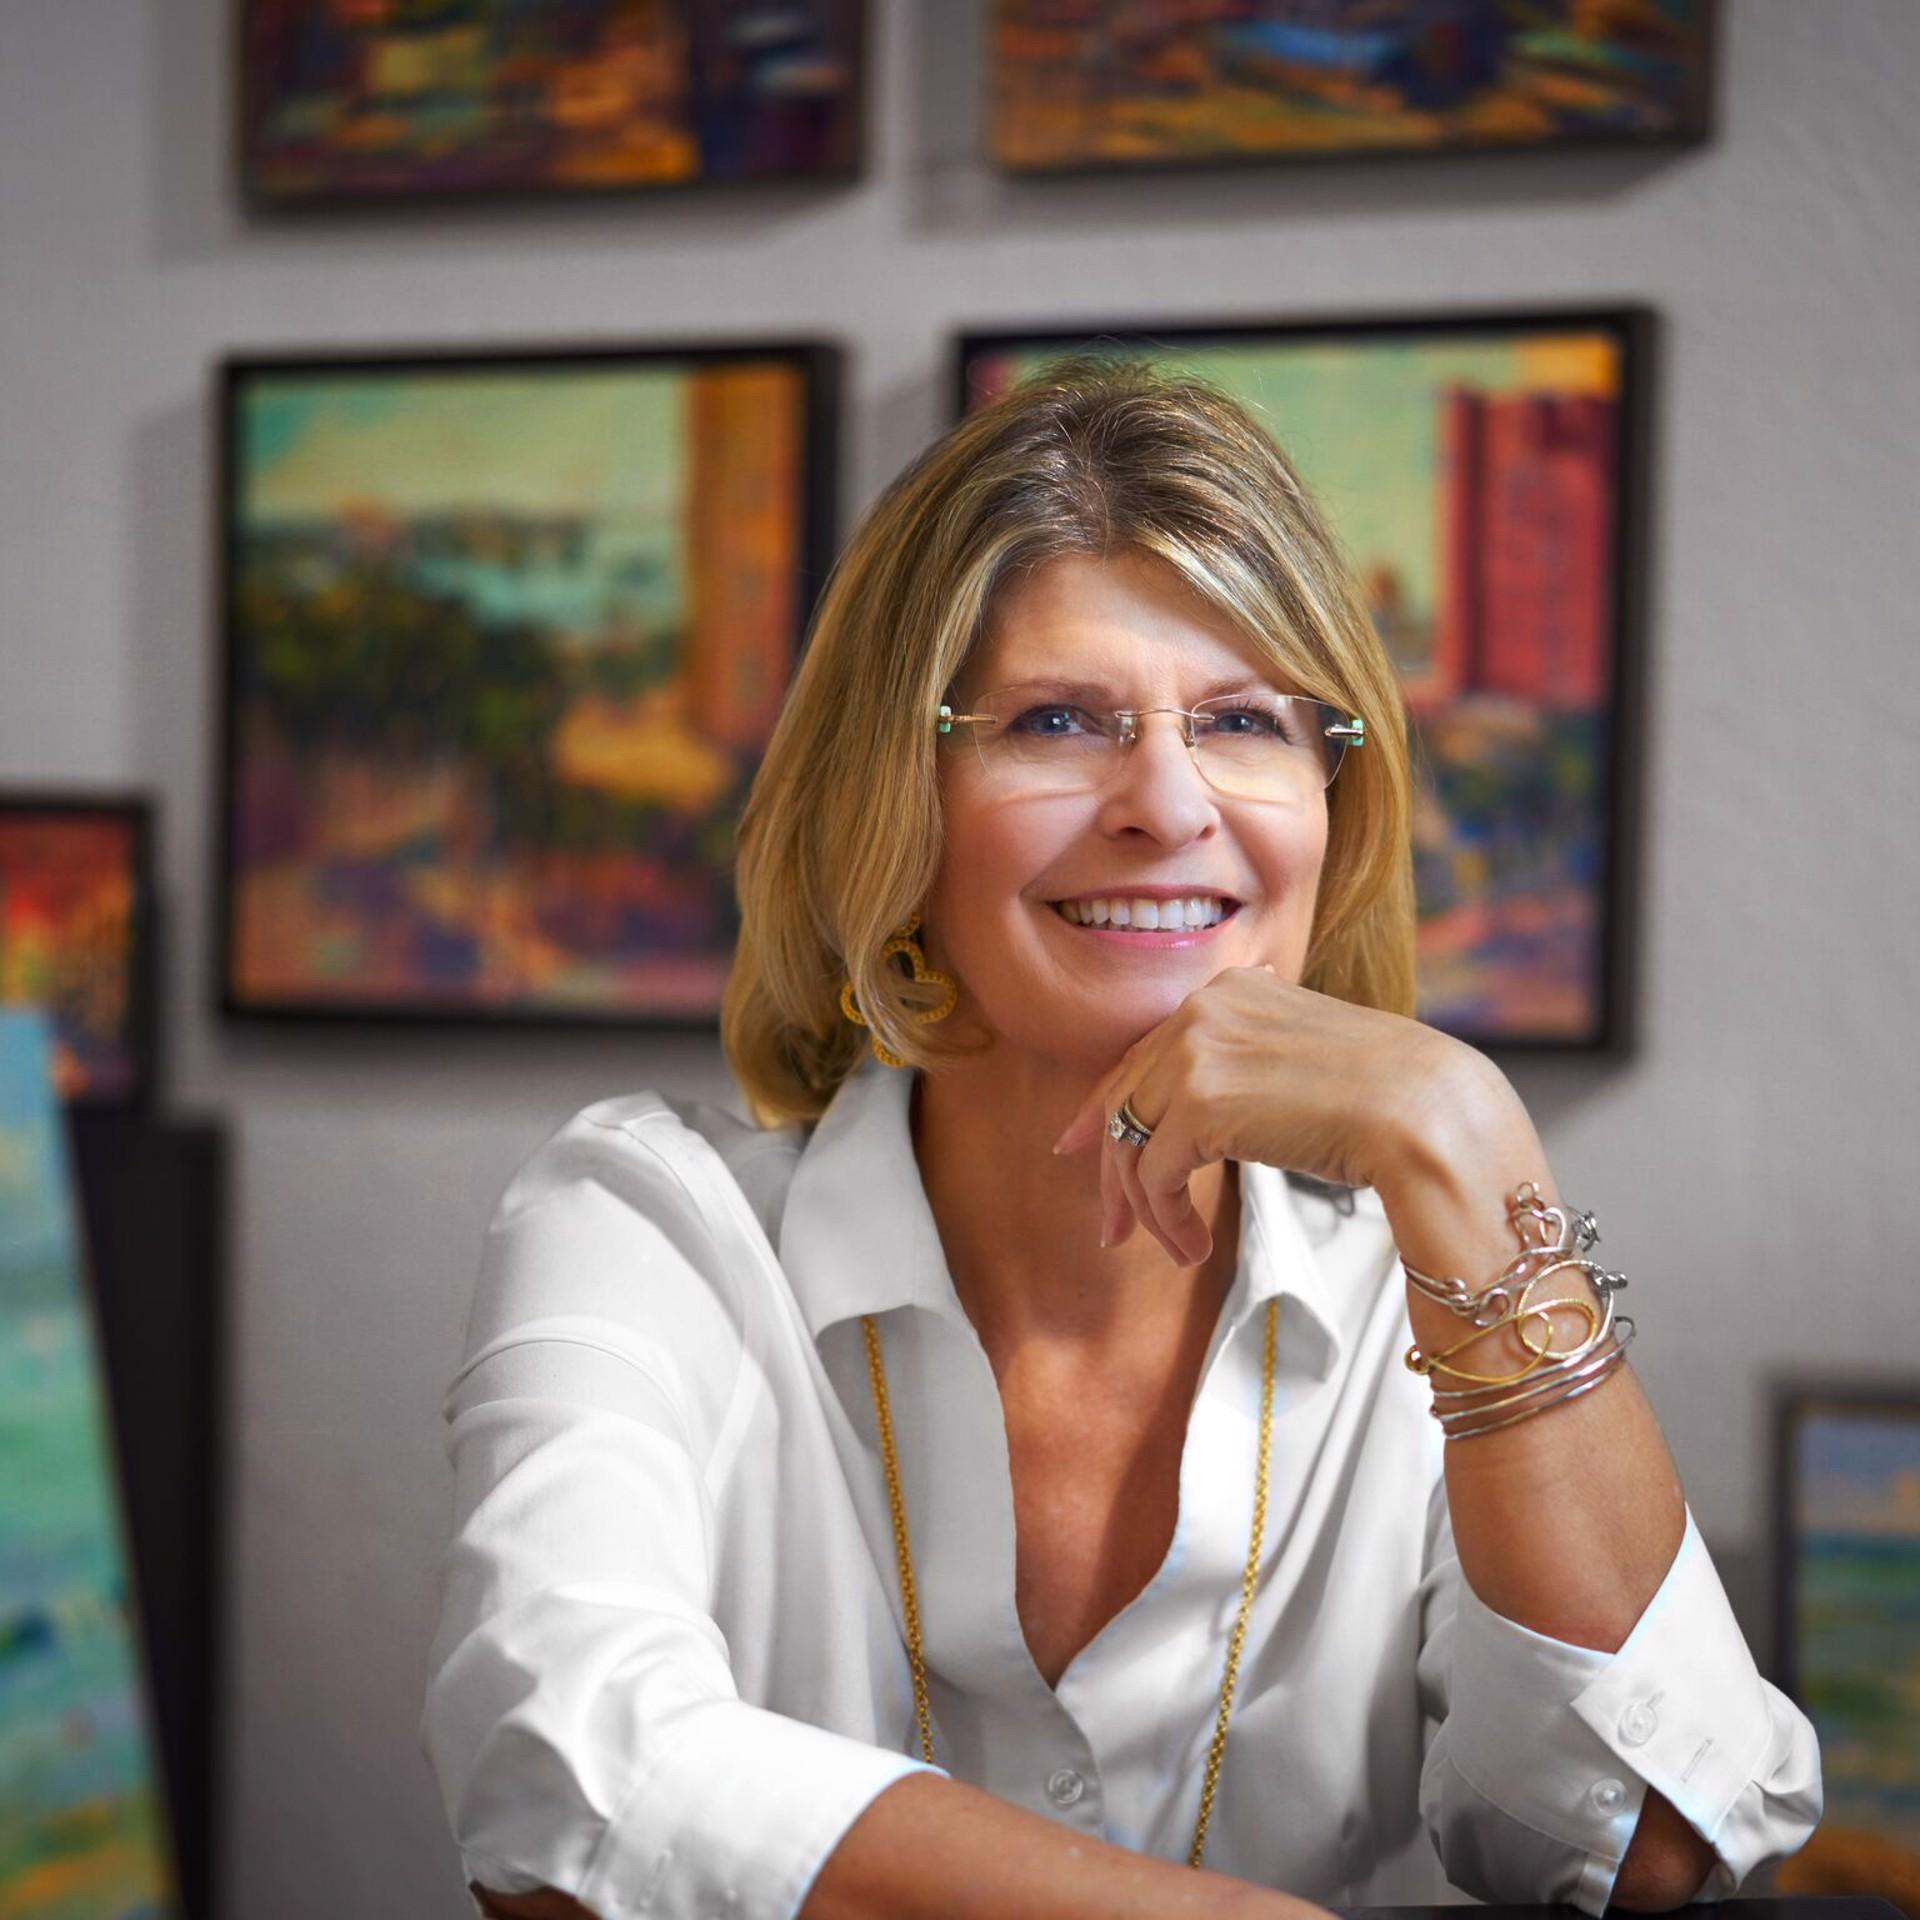 Linda Richichi